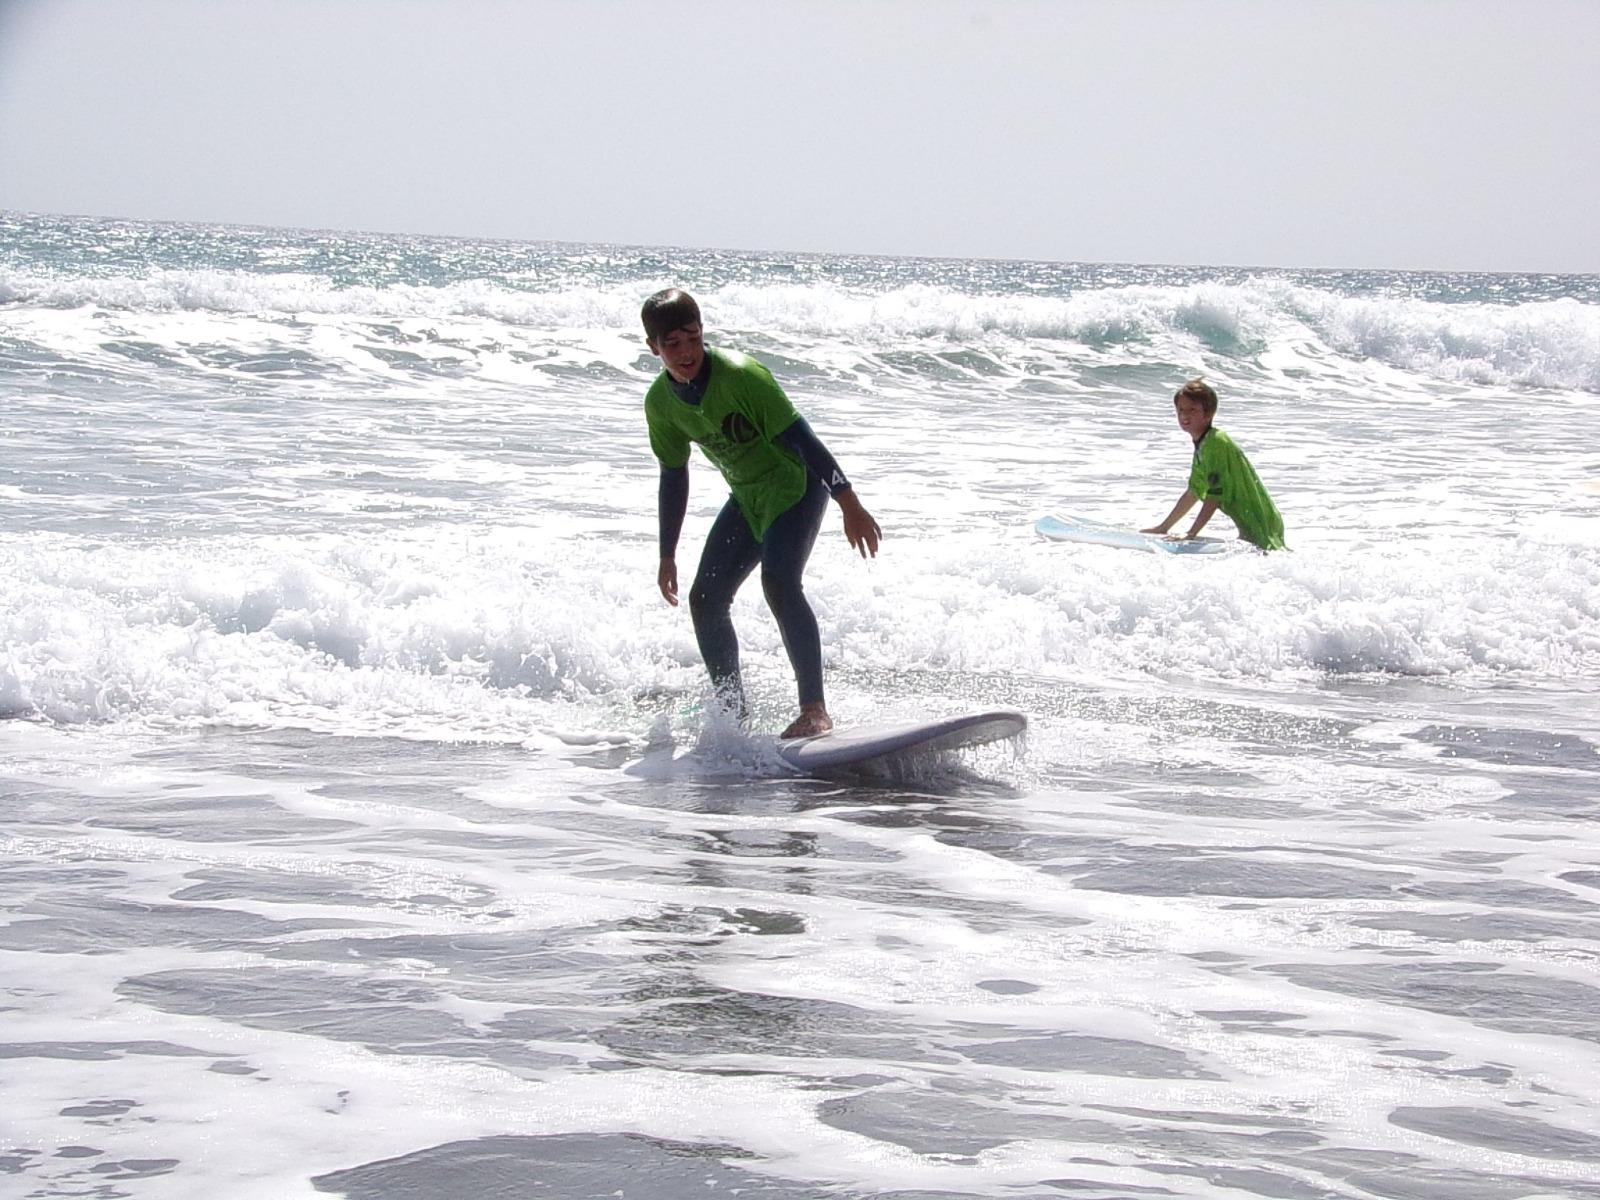 VERANO 2019 2 FUERTE TRIBU SURFWhatsApp Image 2019-08-15 at 15.49.35.jpg